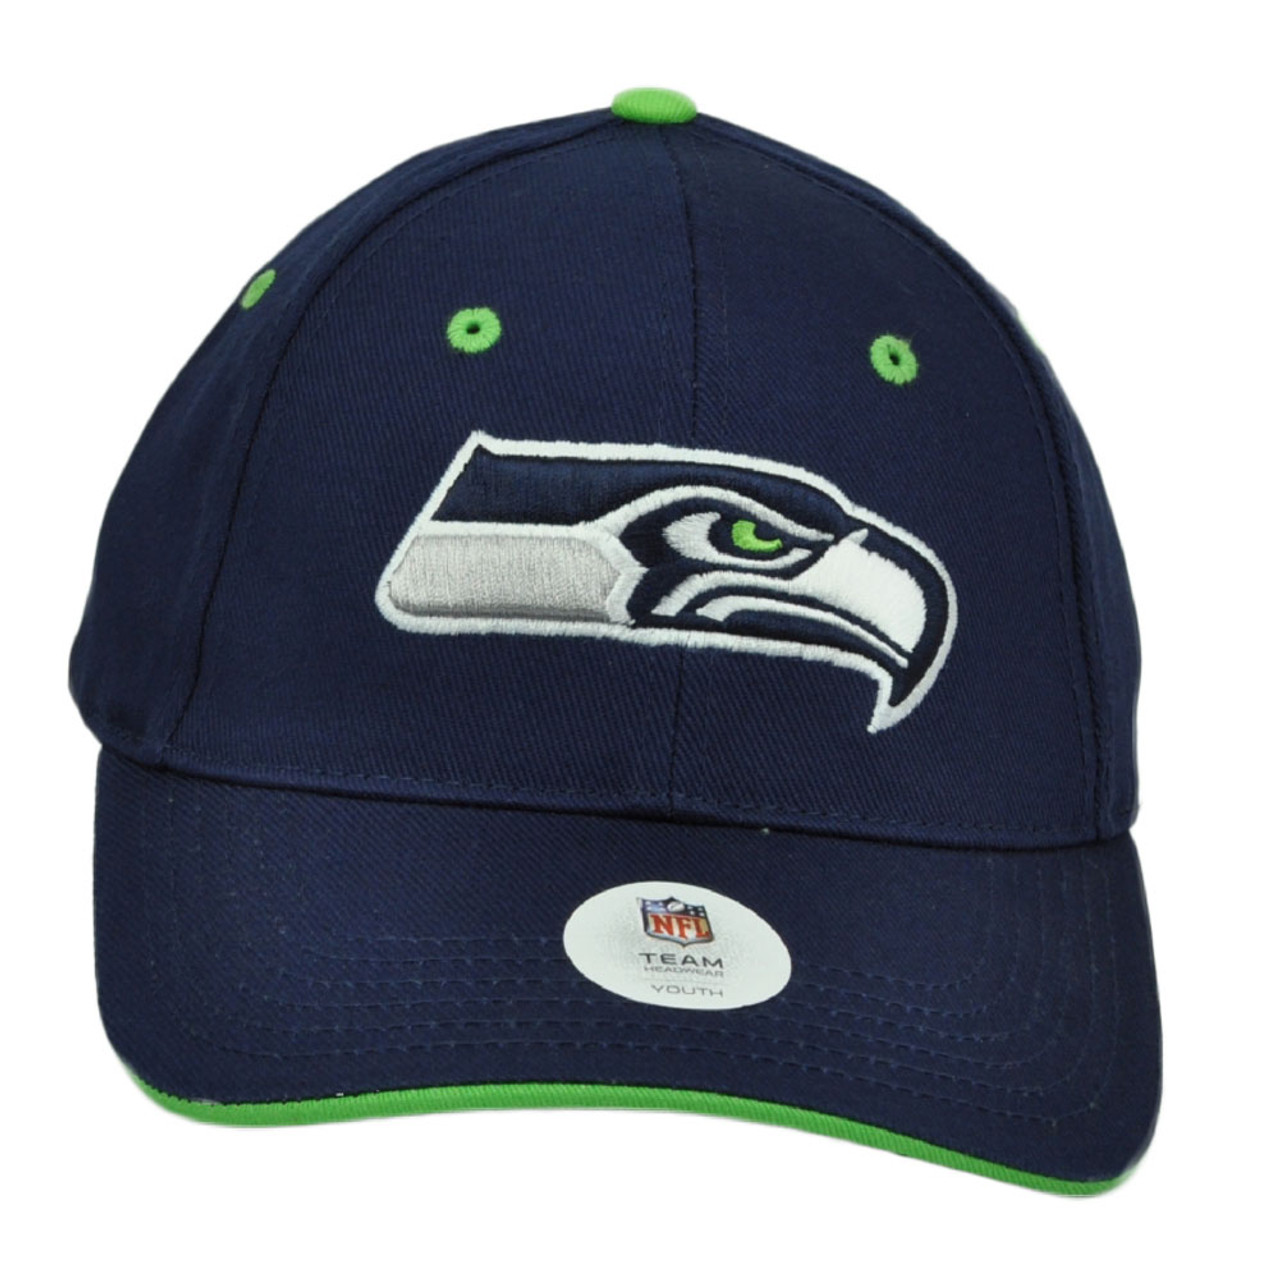 Navy Blue Hat Cap Curved Bill